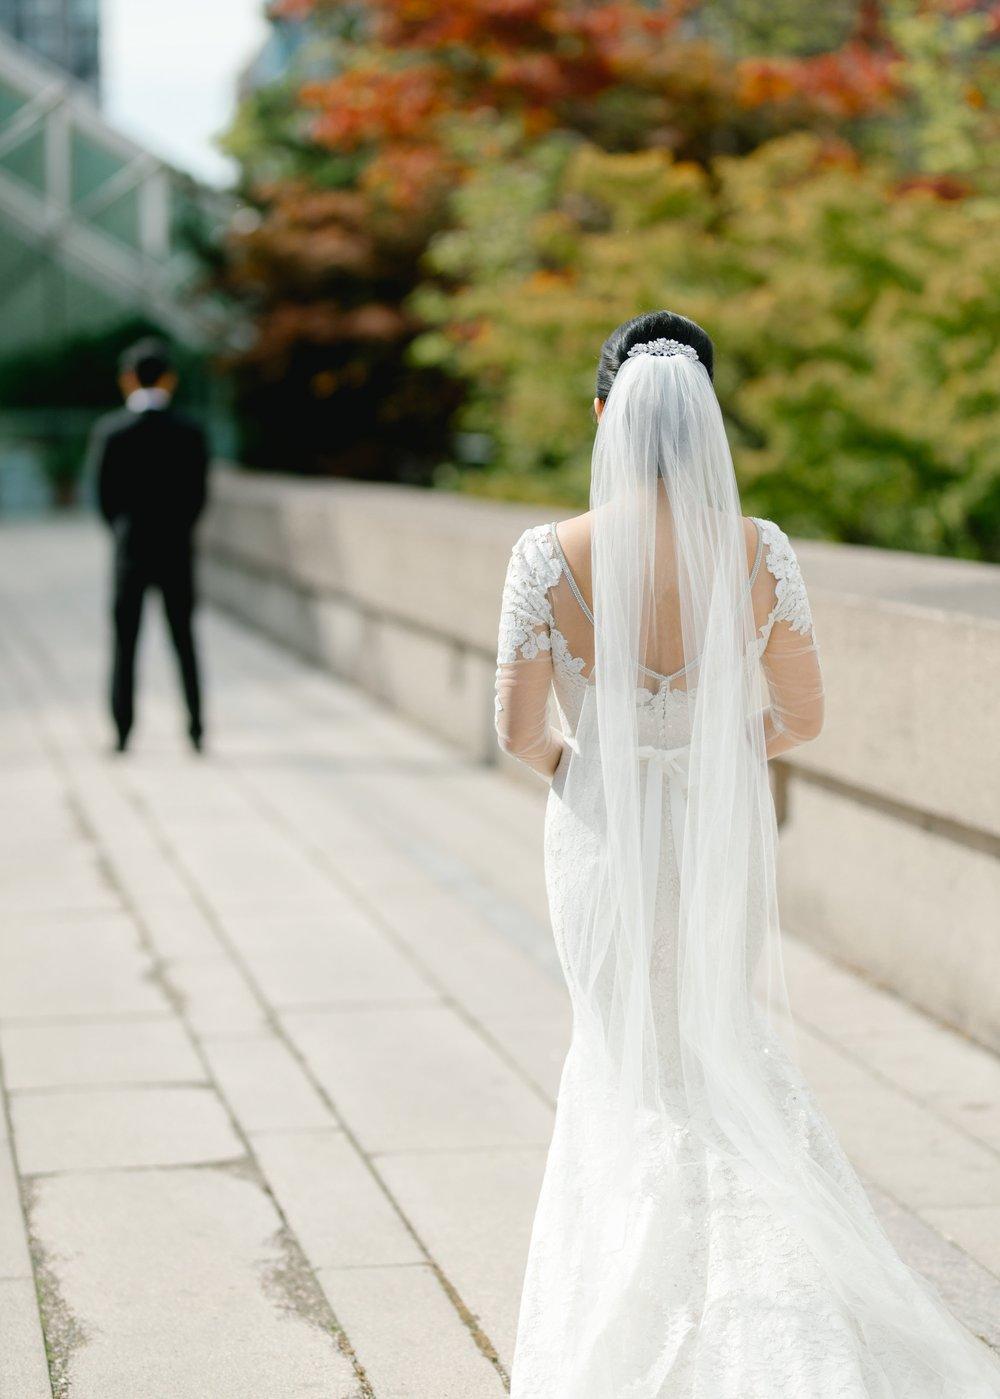 herastudios_wedding_carmen_jayjay_hera_selects-35.jpg